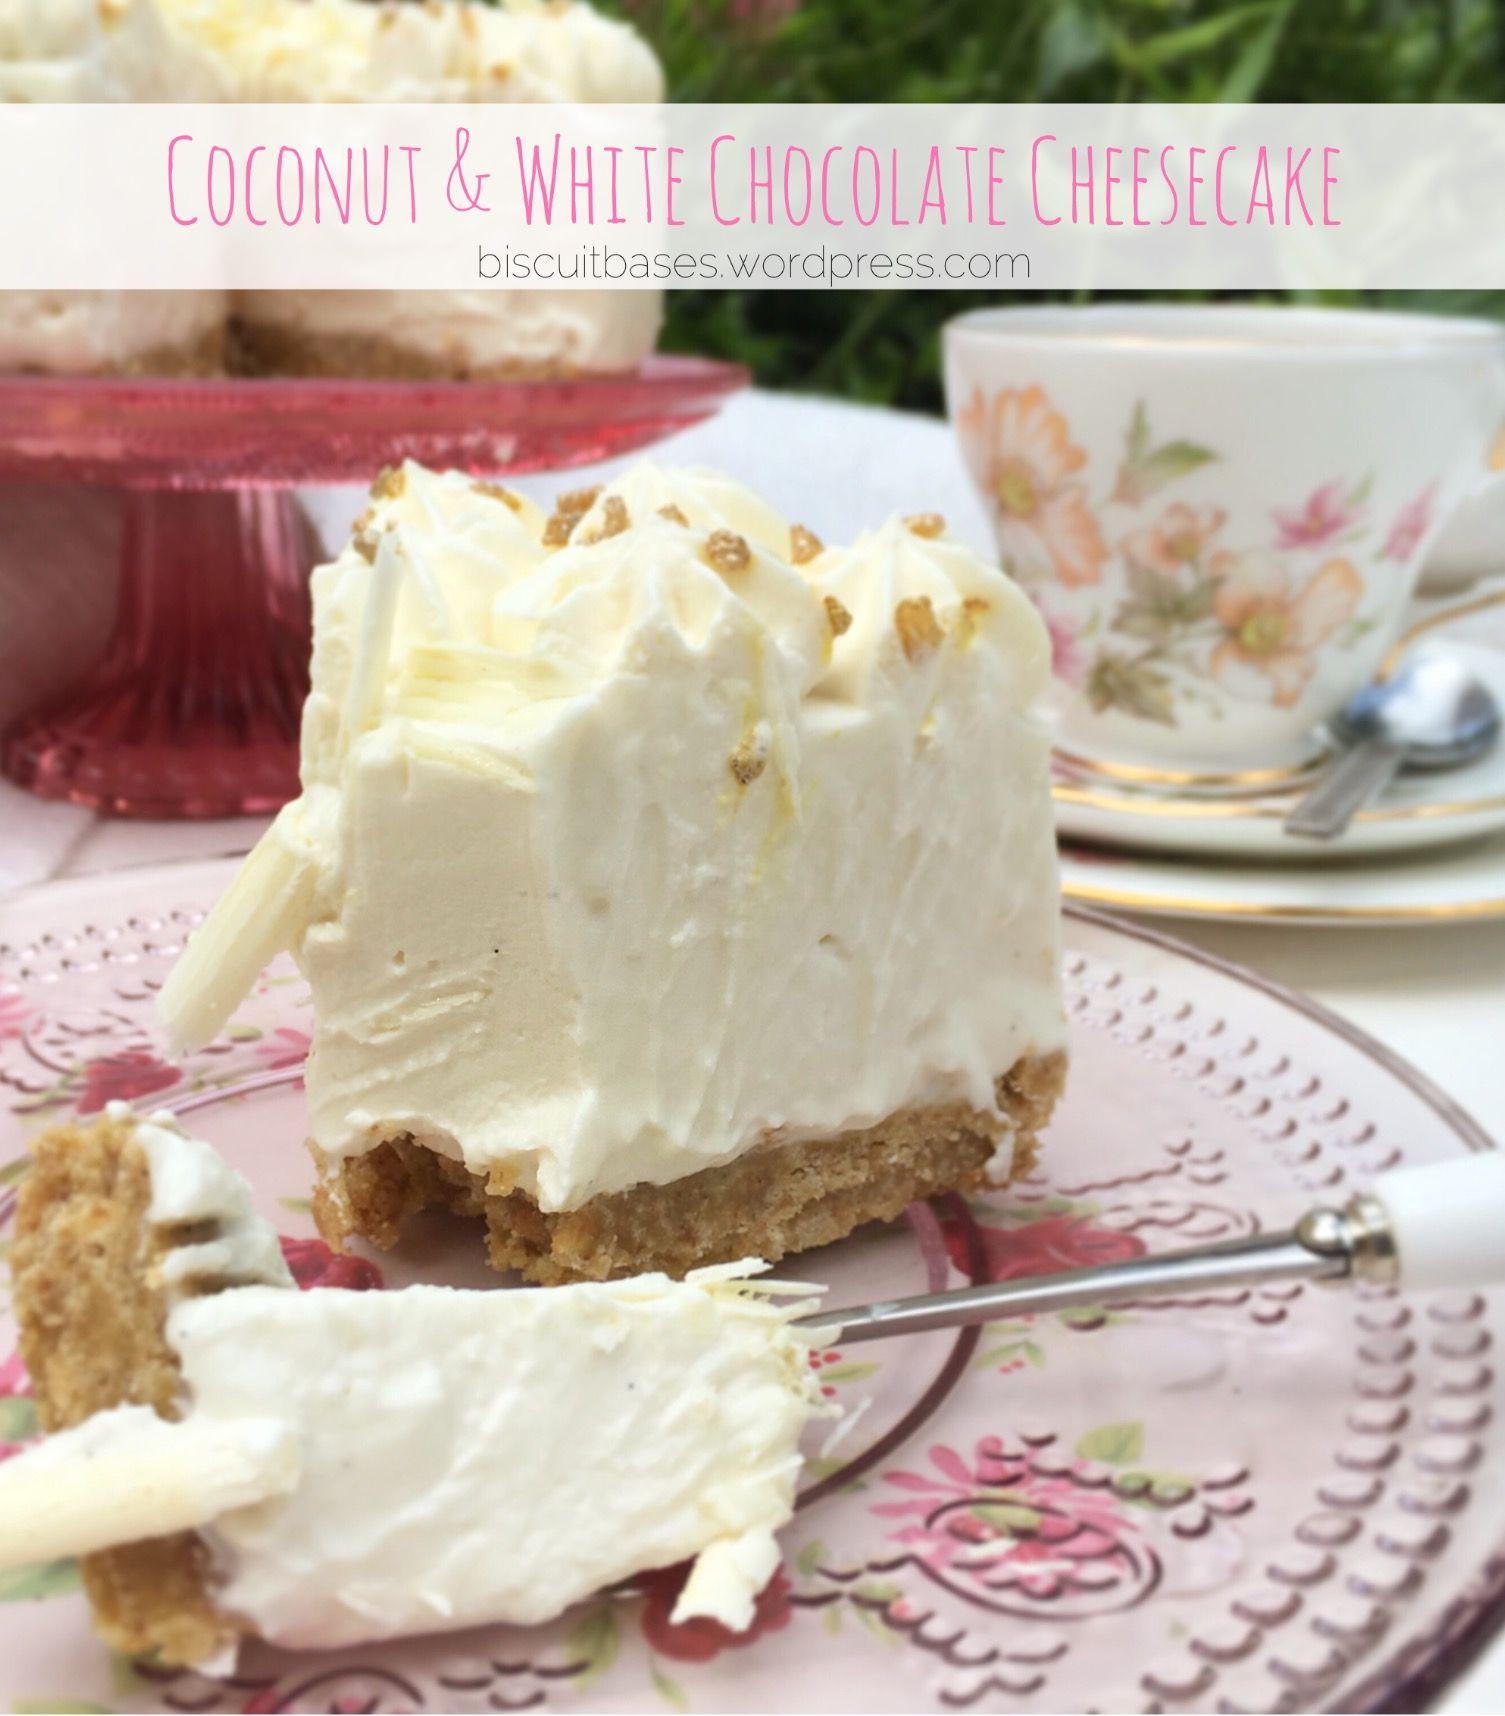 Coconut white chocolate cheesecake chocolate